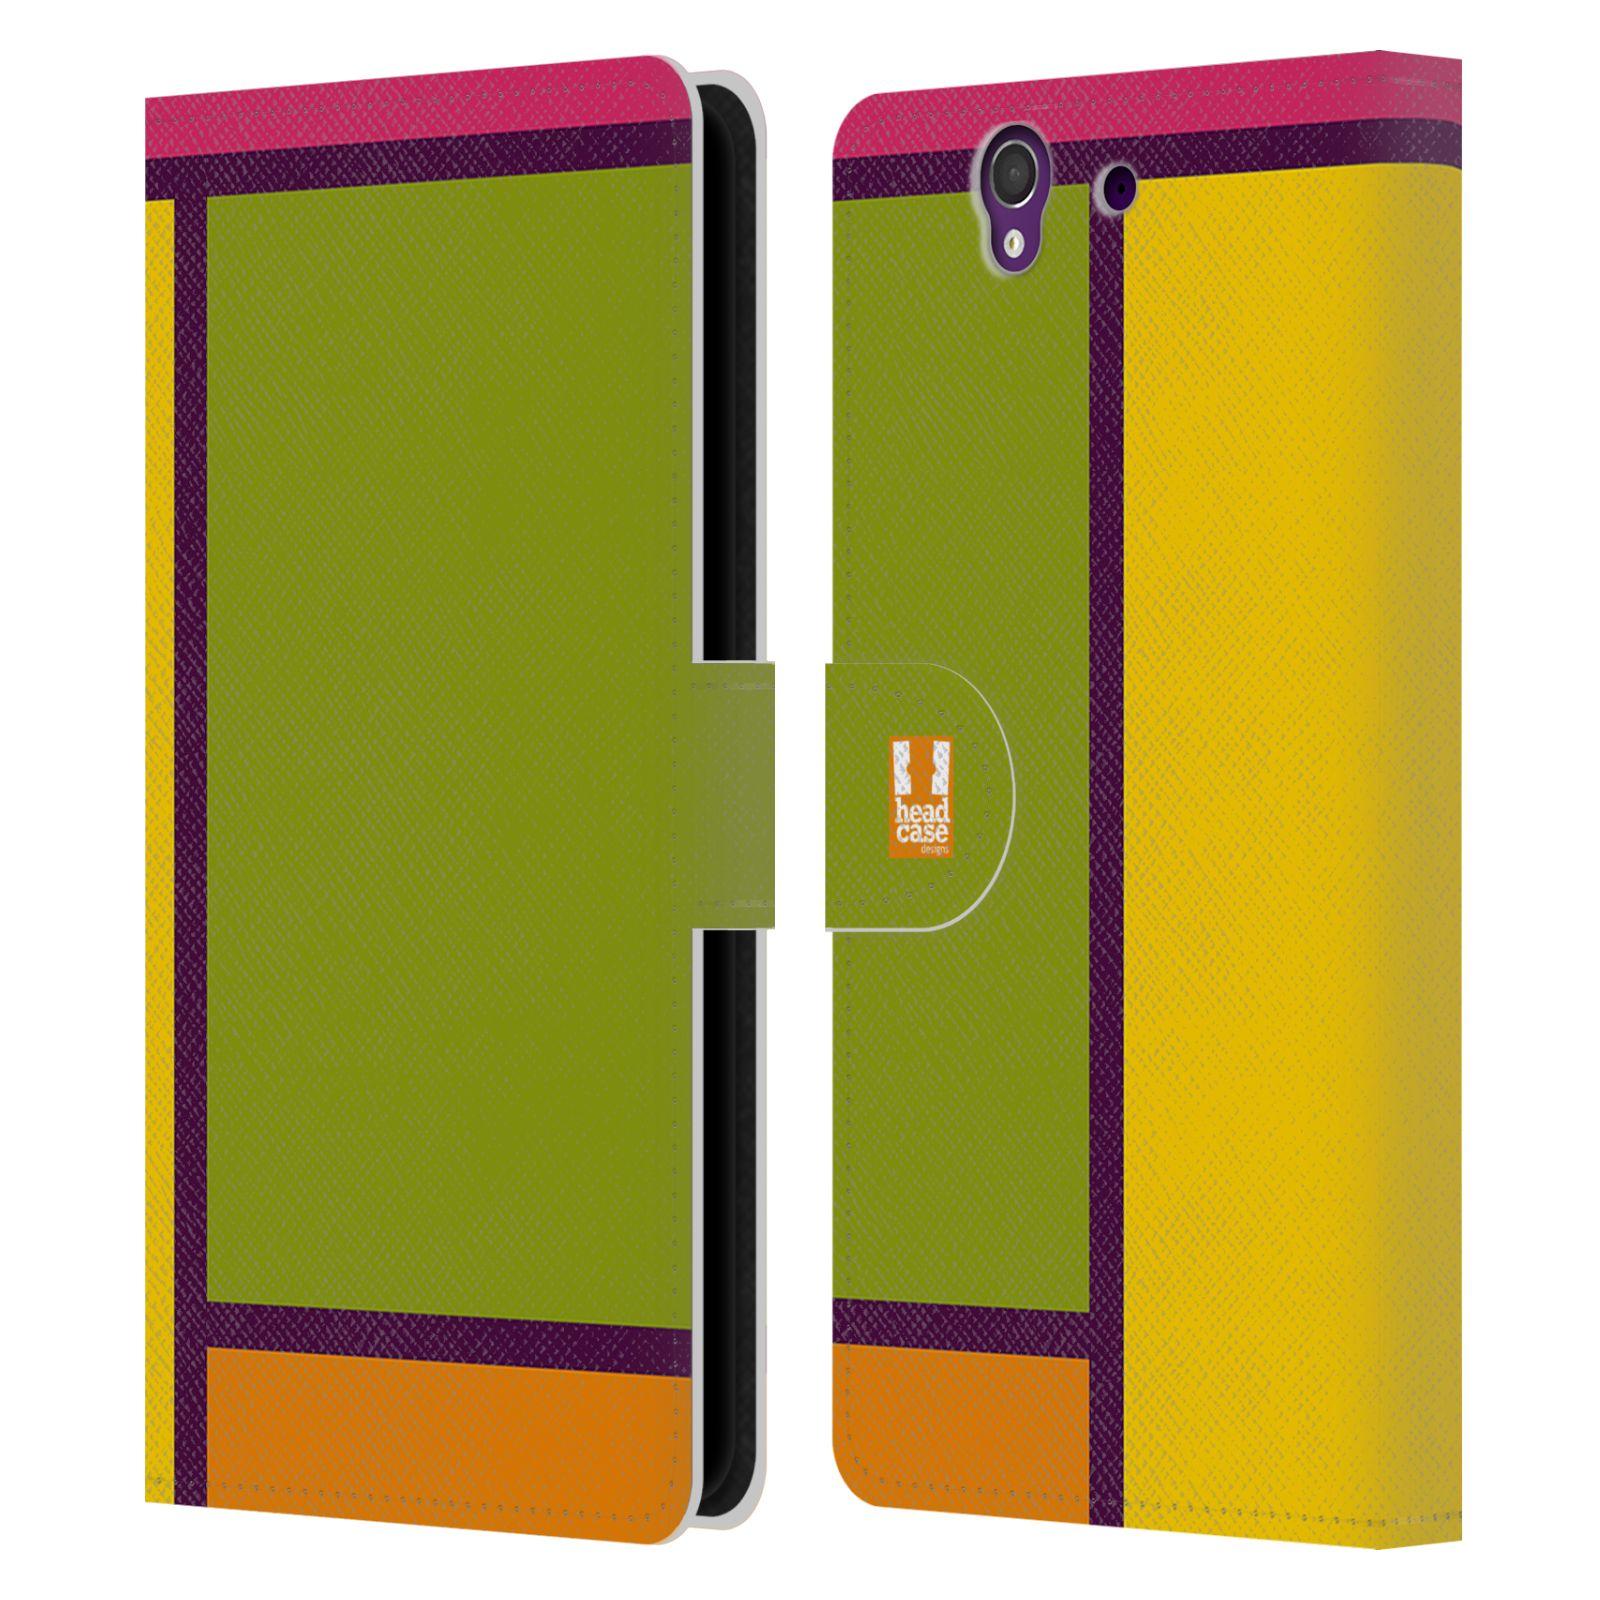 HEAD CASE Flipové pouzdro pro mobil SONY XPERIA Z (C6603) MODERN barevná kostka zelená a žlutá